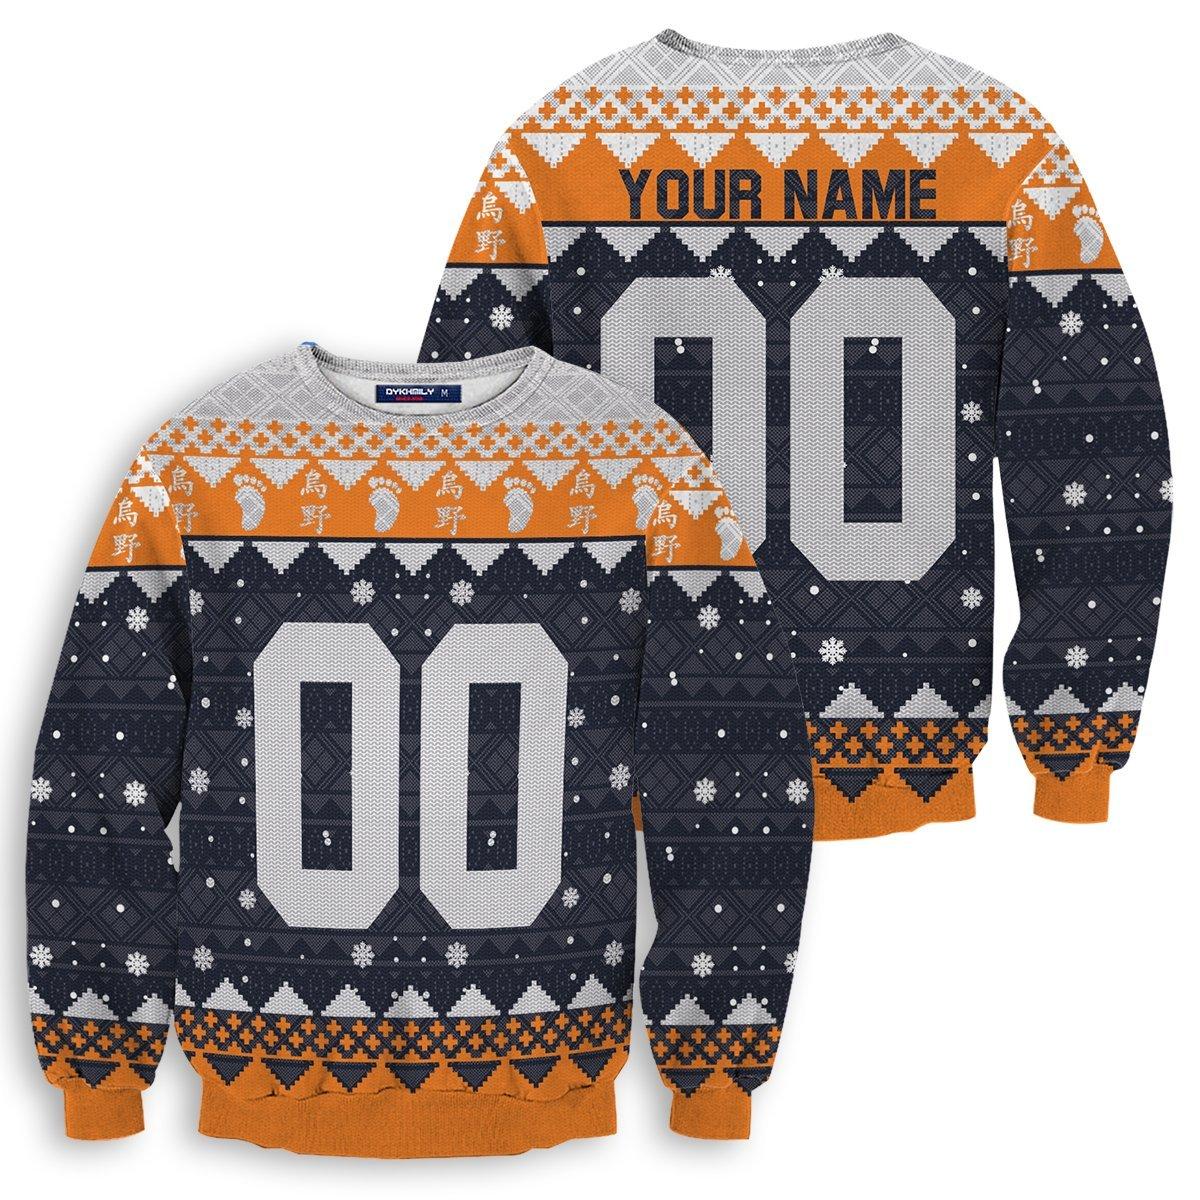 Personalized Karasuno Christmas Unisex Wool Sweater FDM0310 S Official Otaku Treat Merch